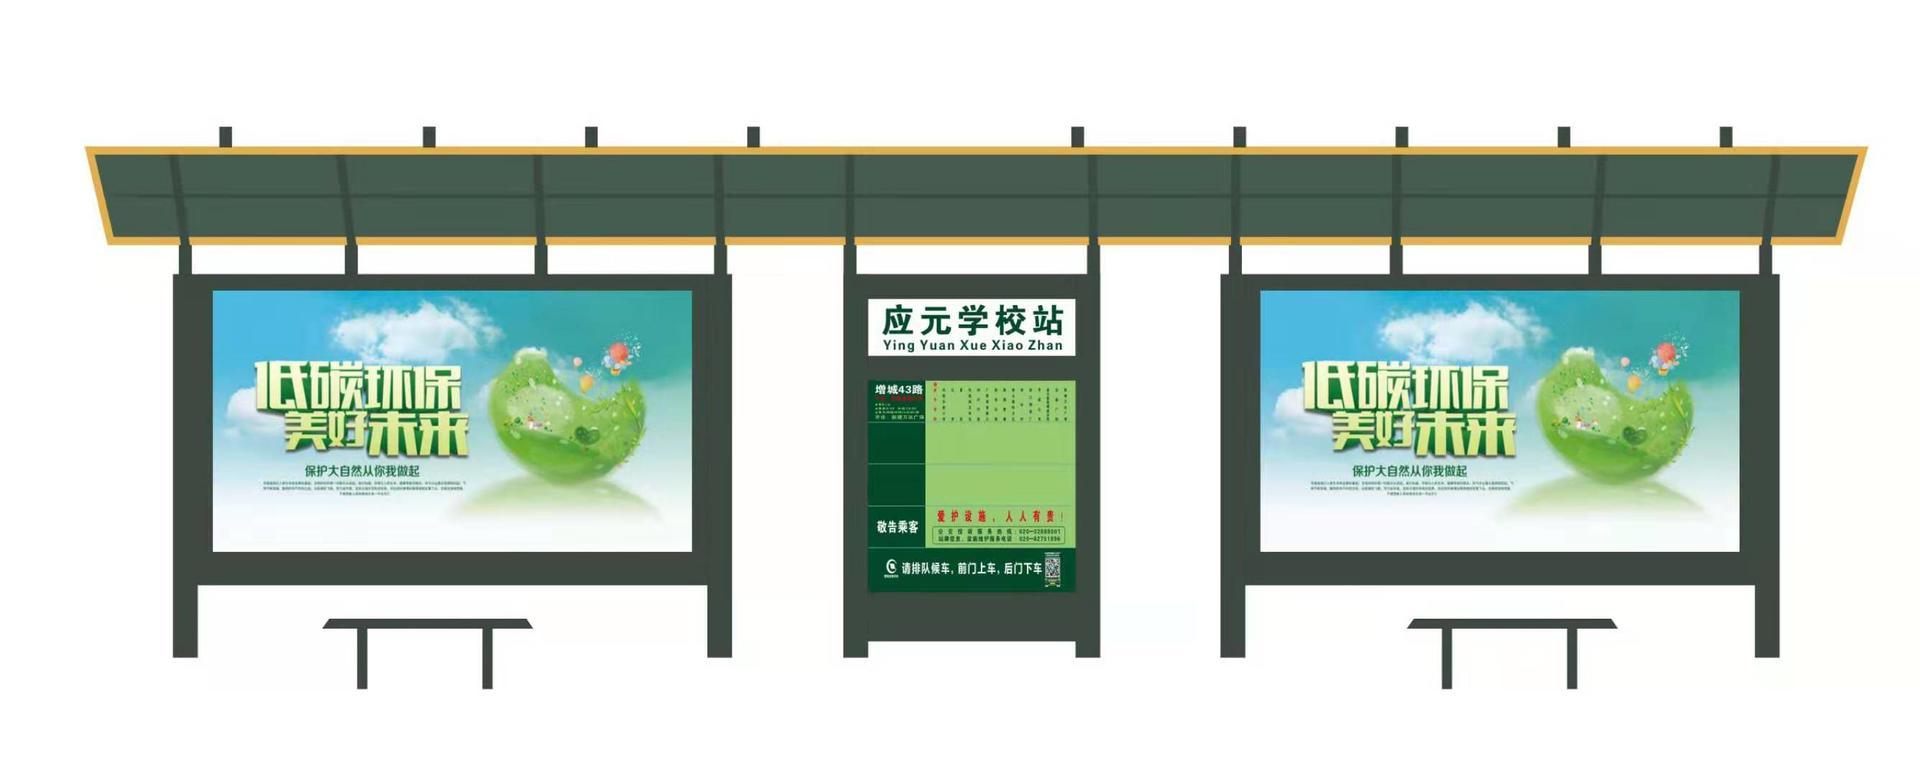 Bus shelter Case - Guangzhou style